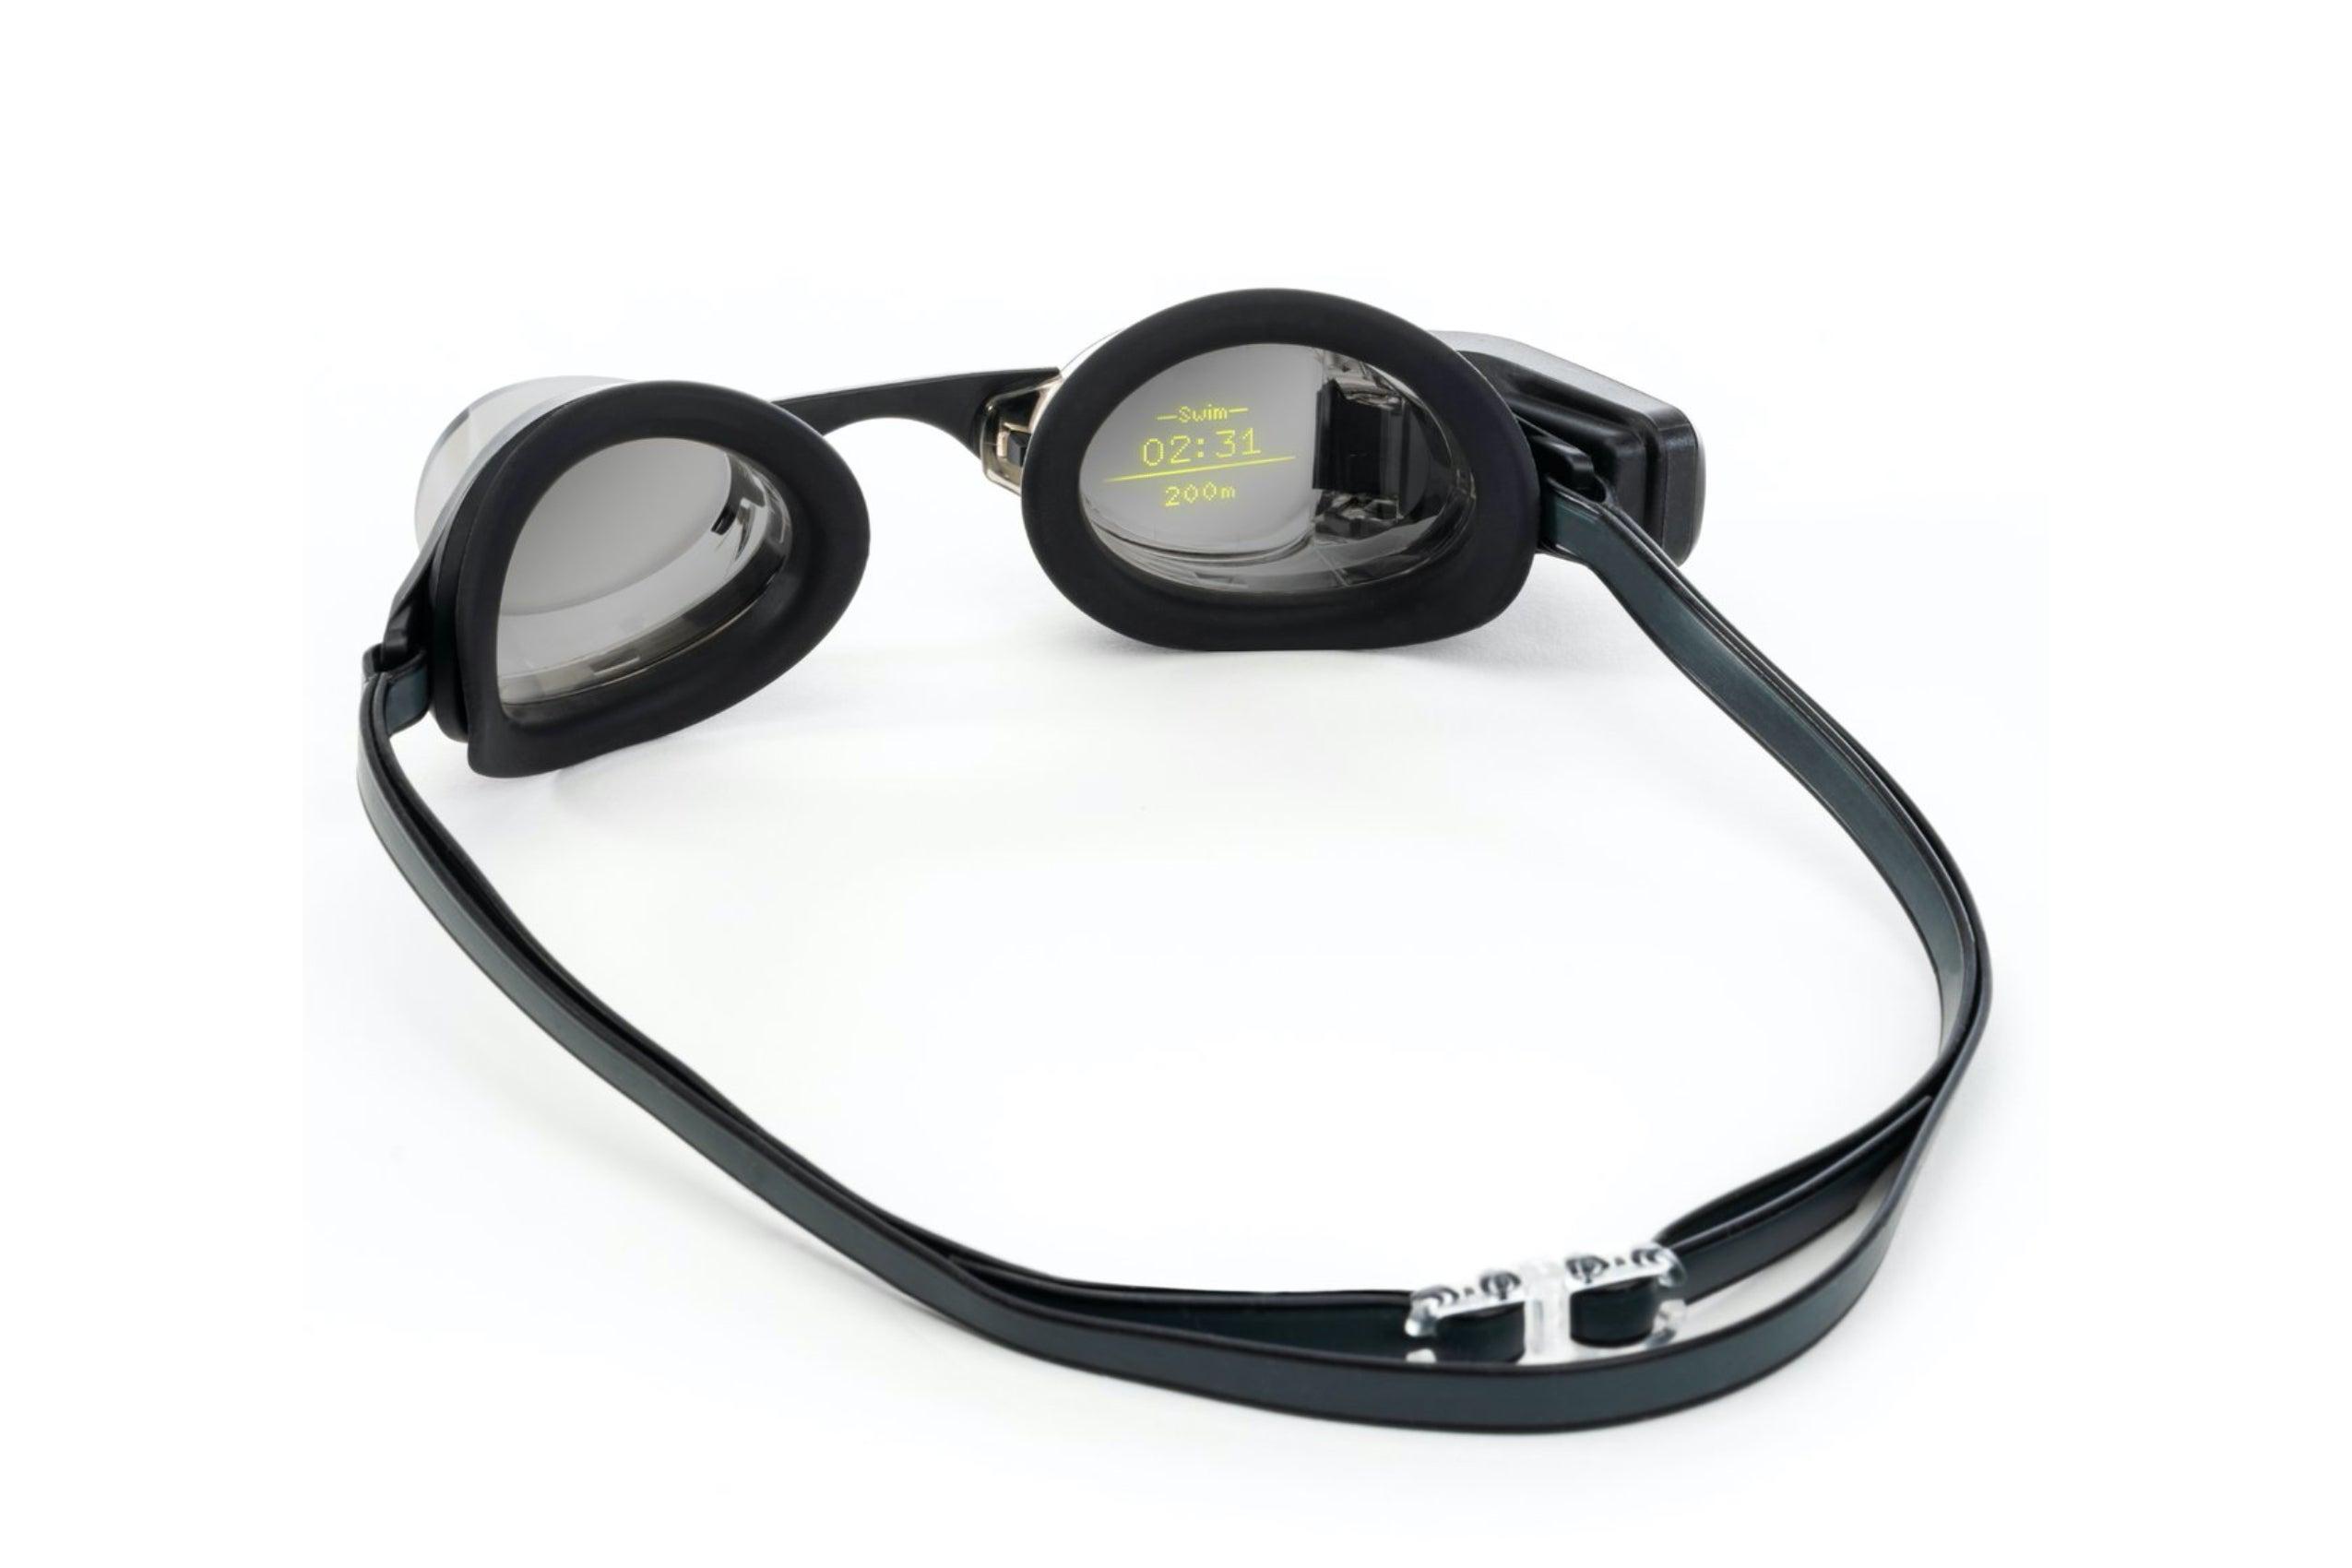 Best Triathlon Goggles - Form Swim